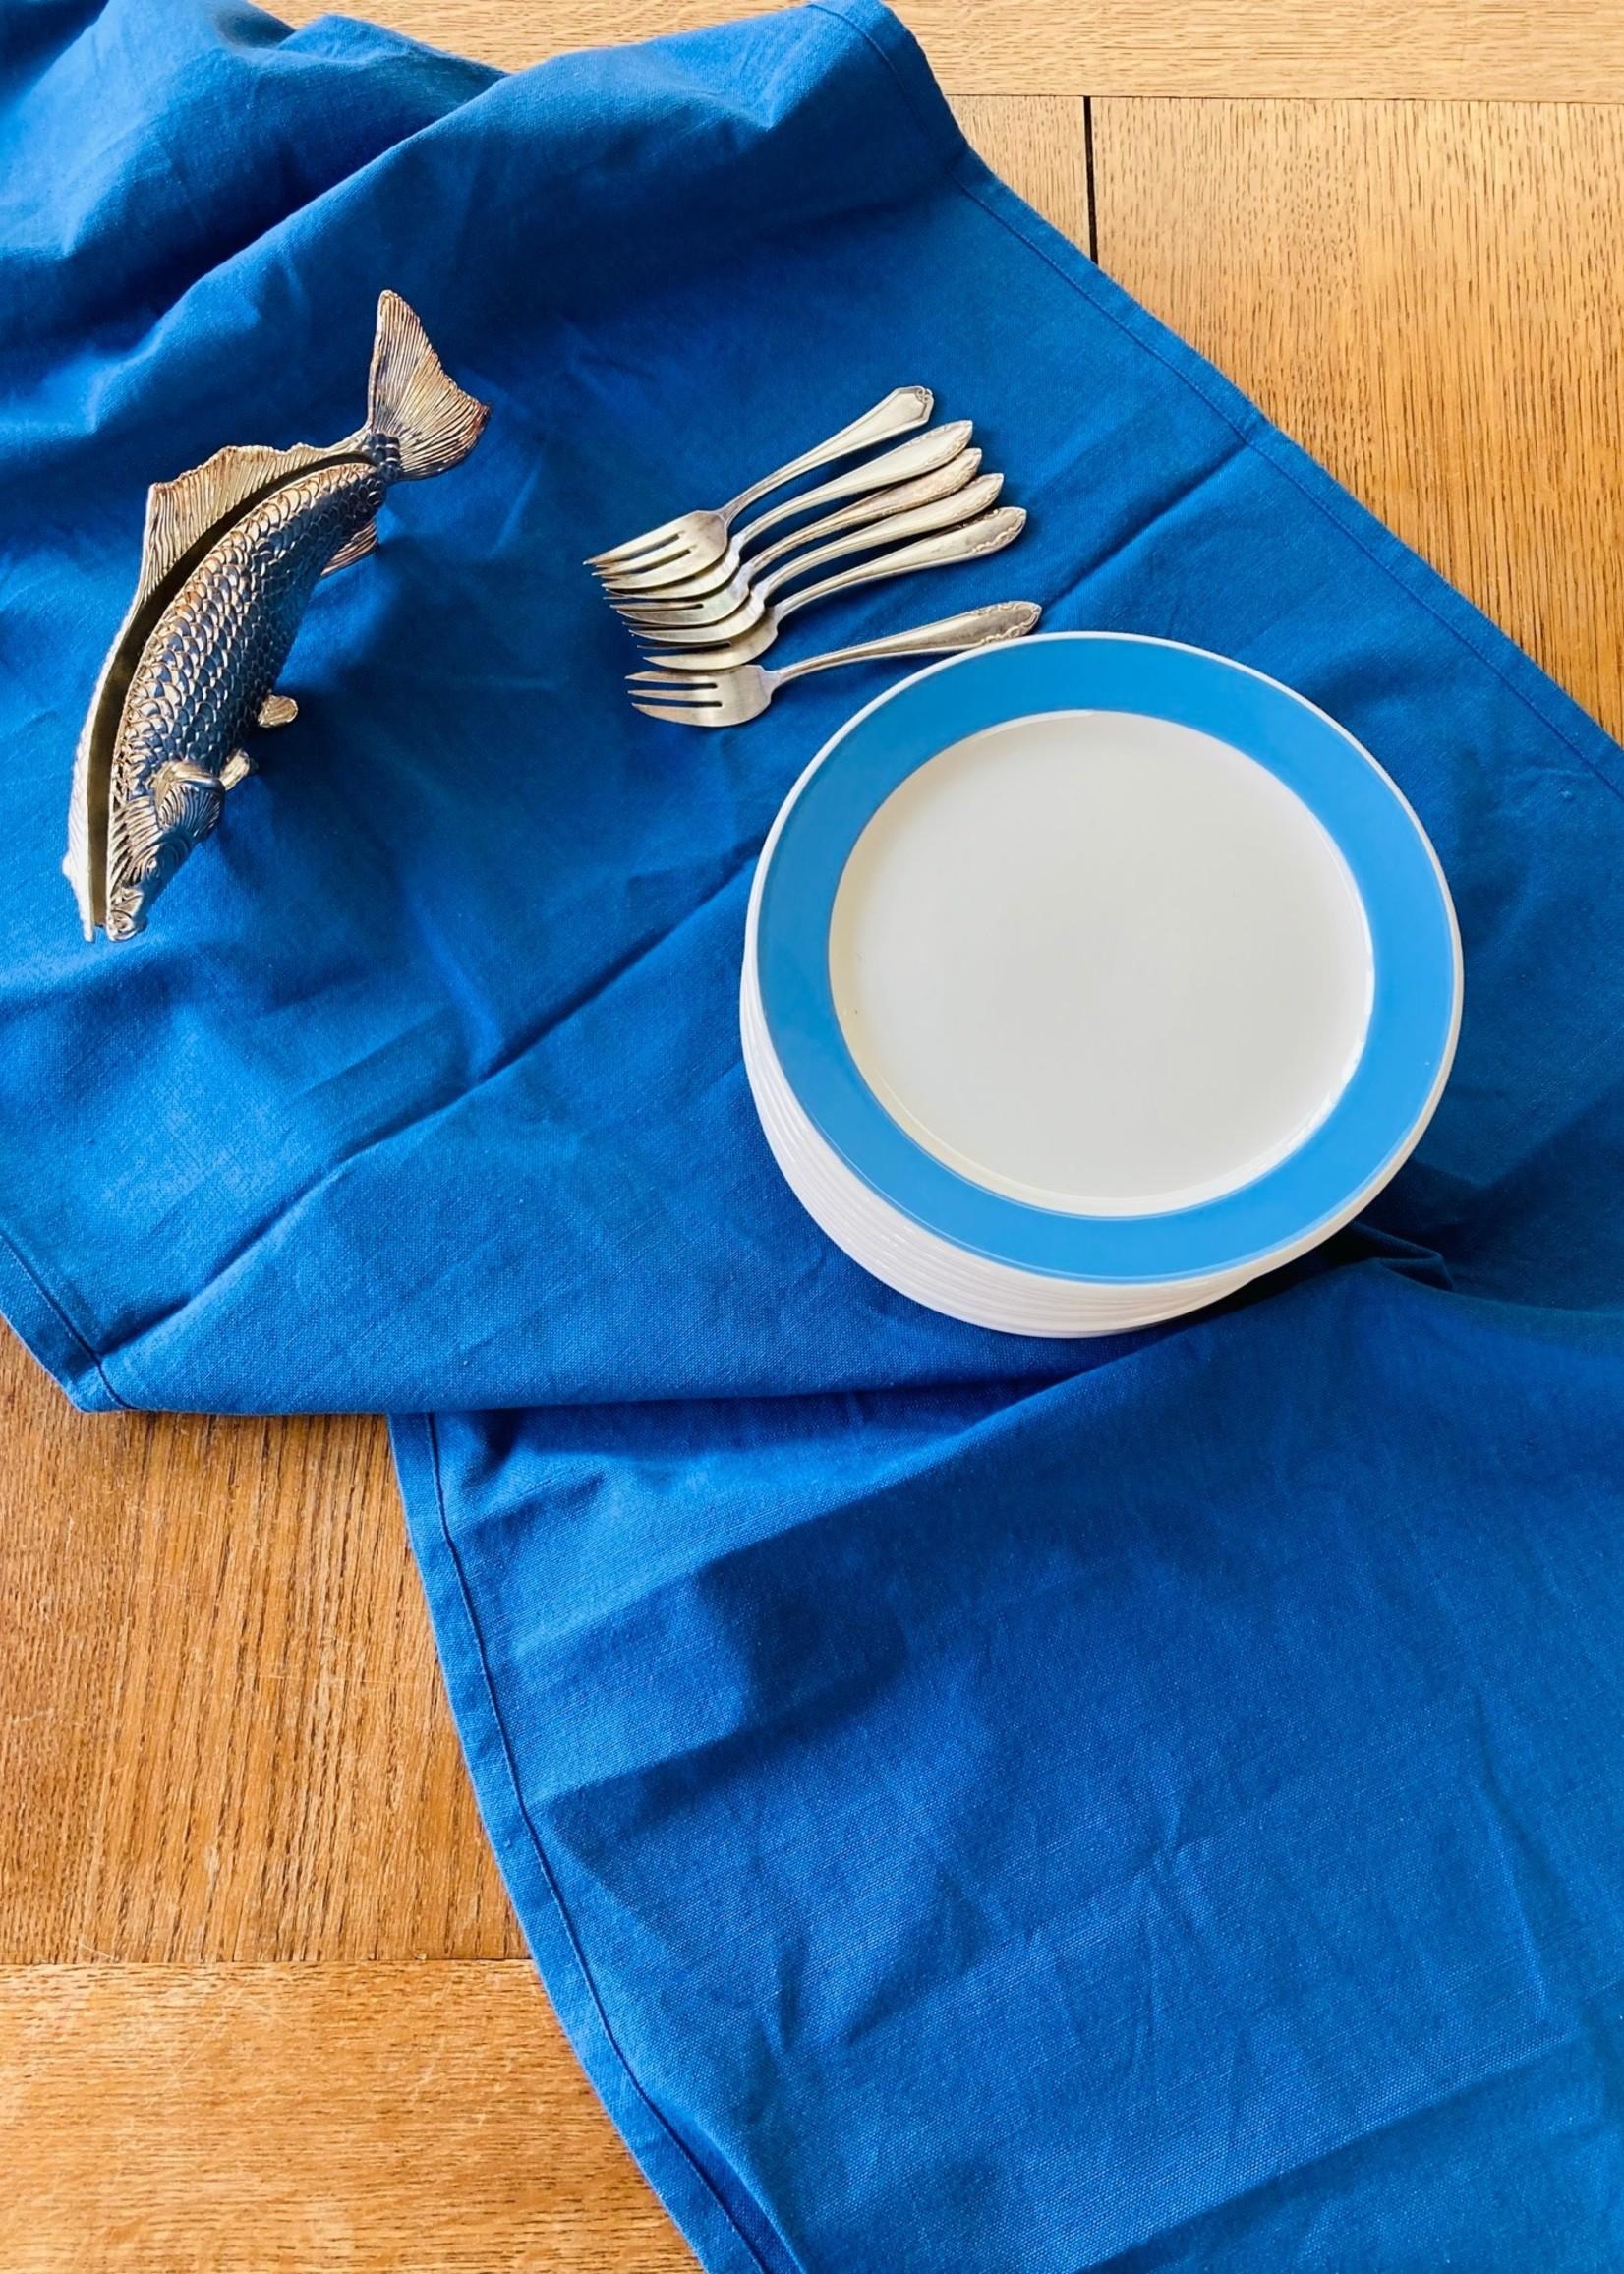 Dessert plates Blue Decor Orléans Villeroy & Boch France